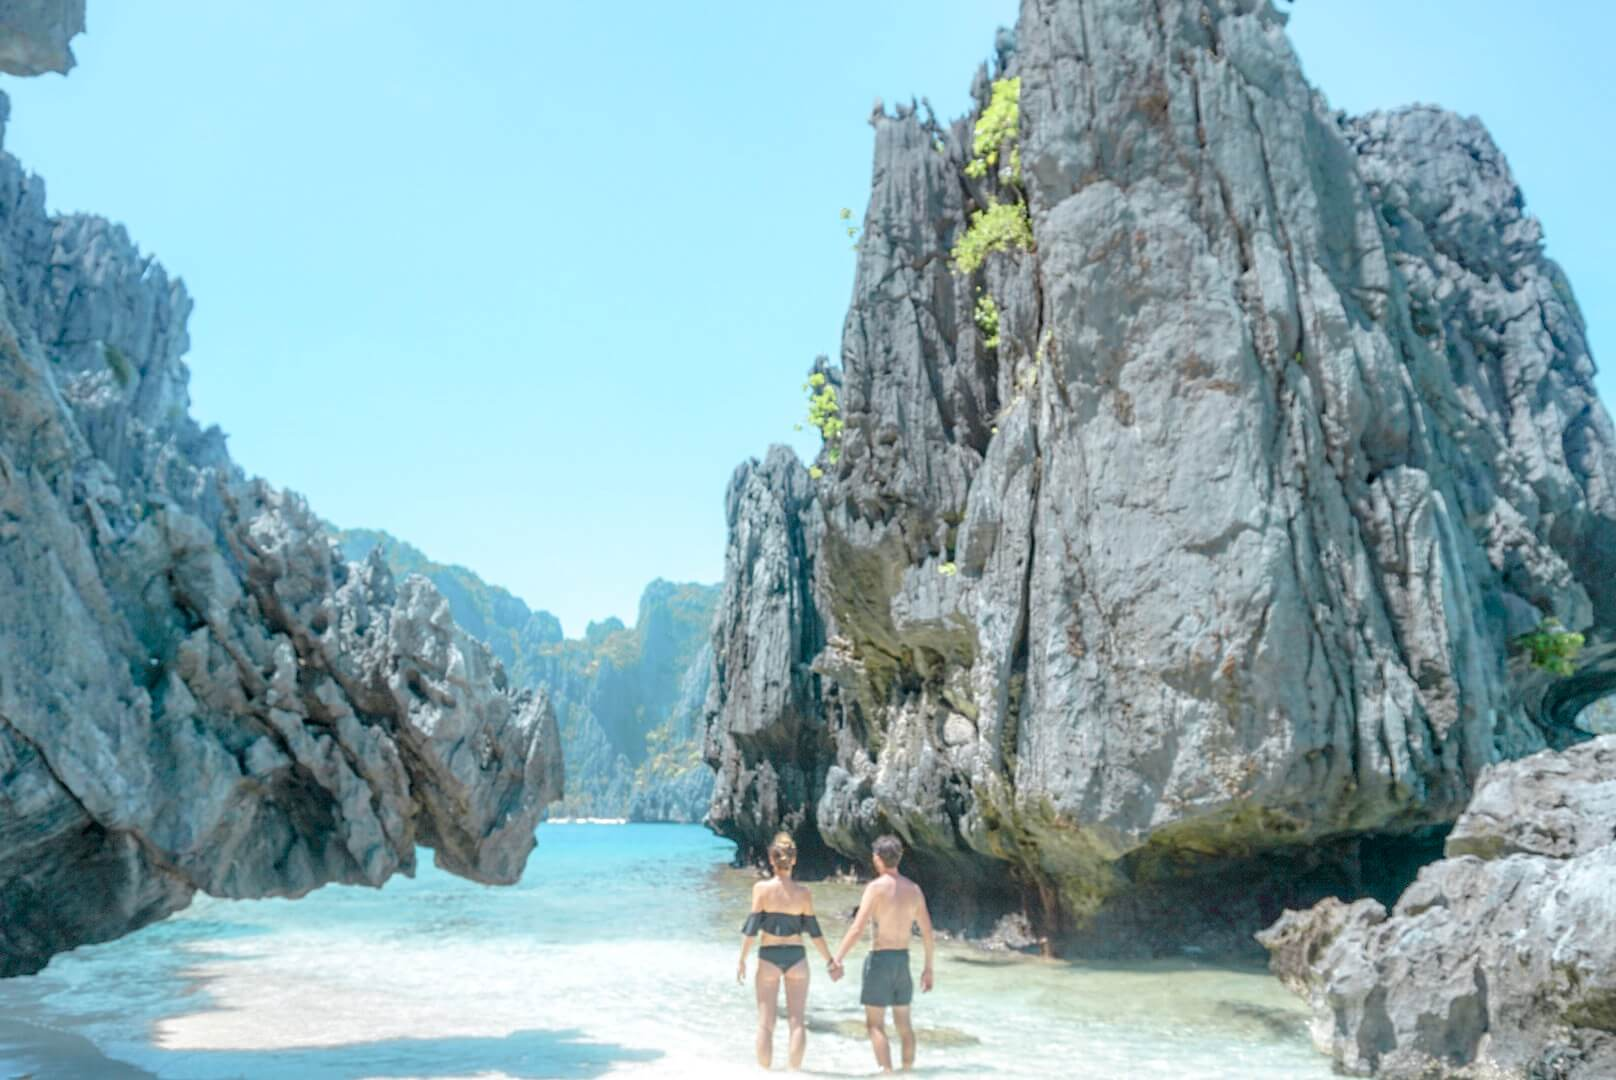 Baie de Bacuits Shimizu island hopping Philippines El nido